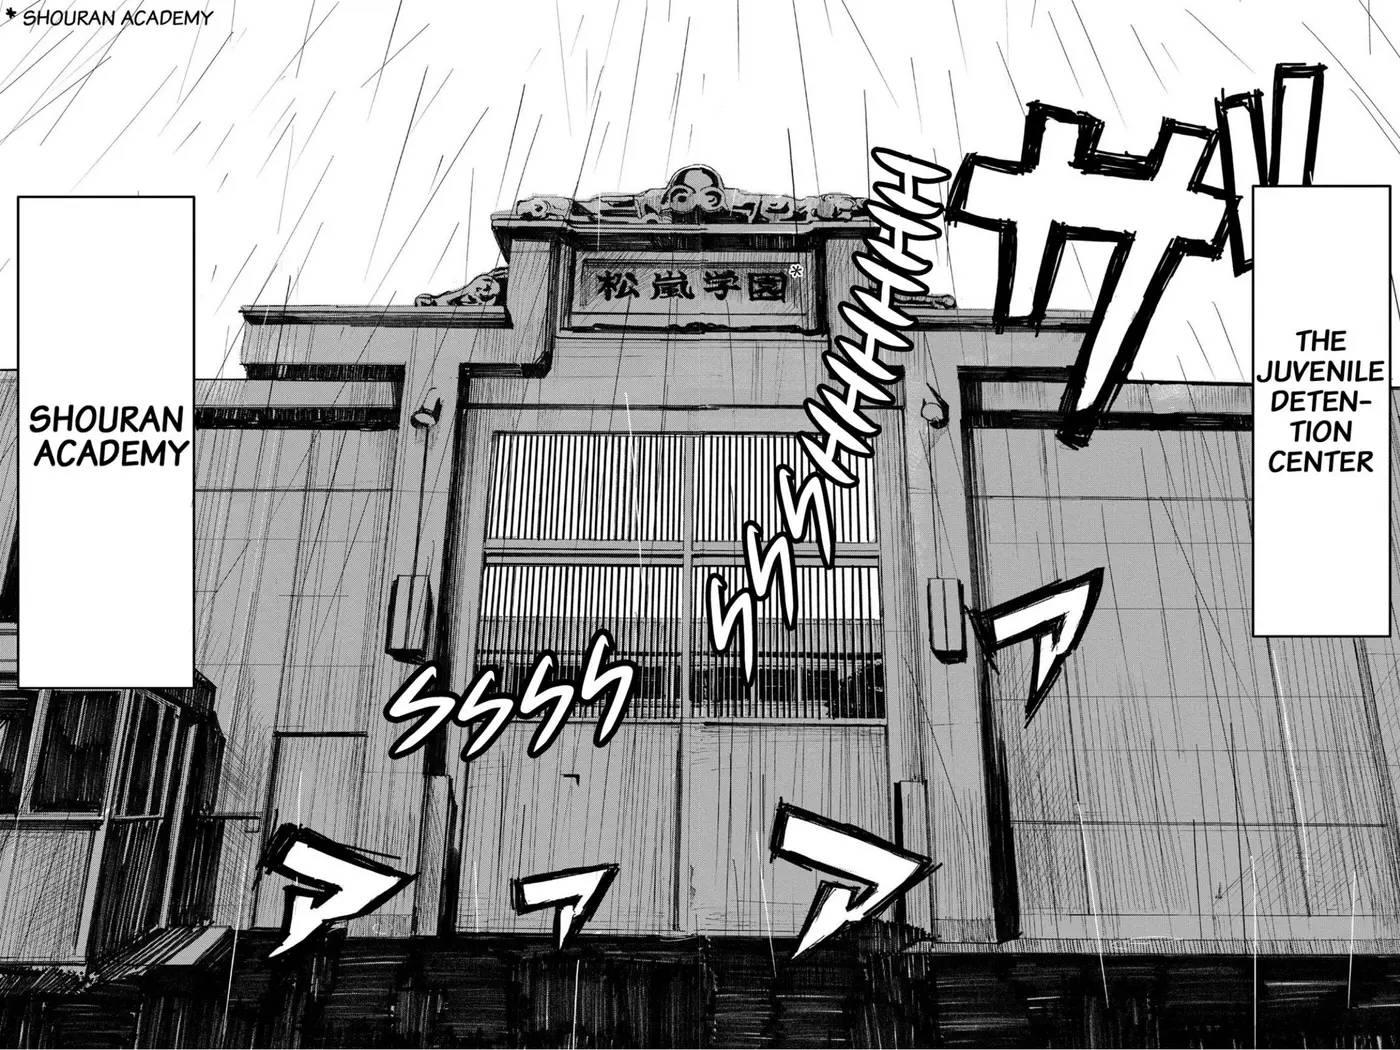 Fort of Apocalypse